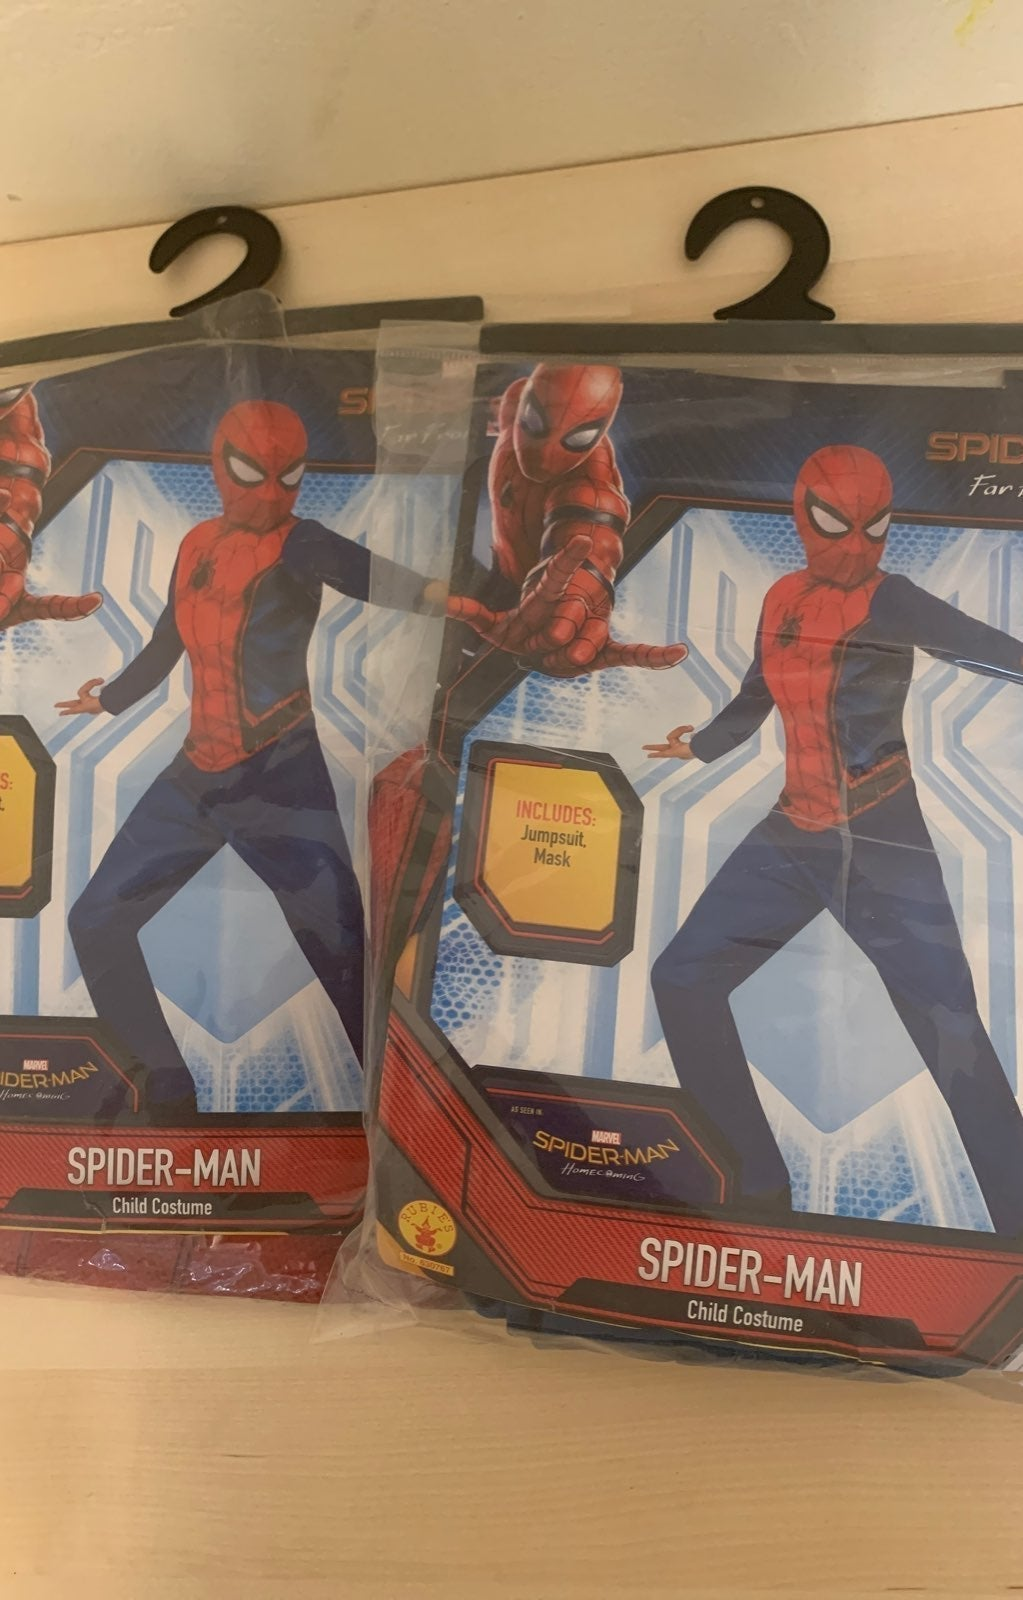 2 Spider-Man Child Costume L